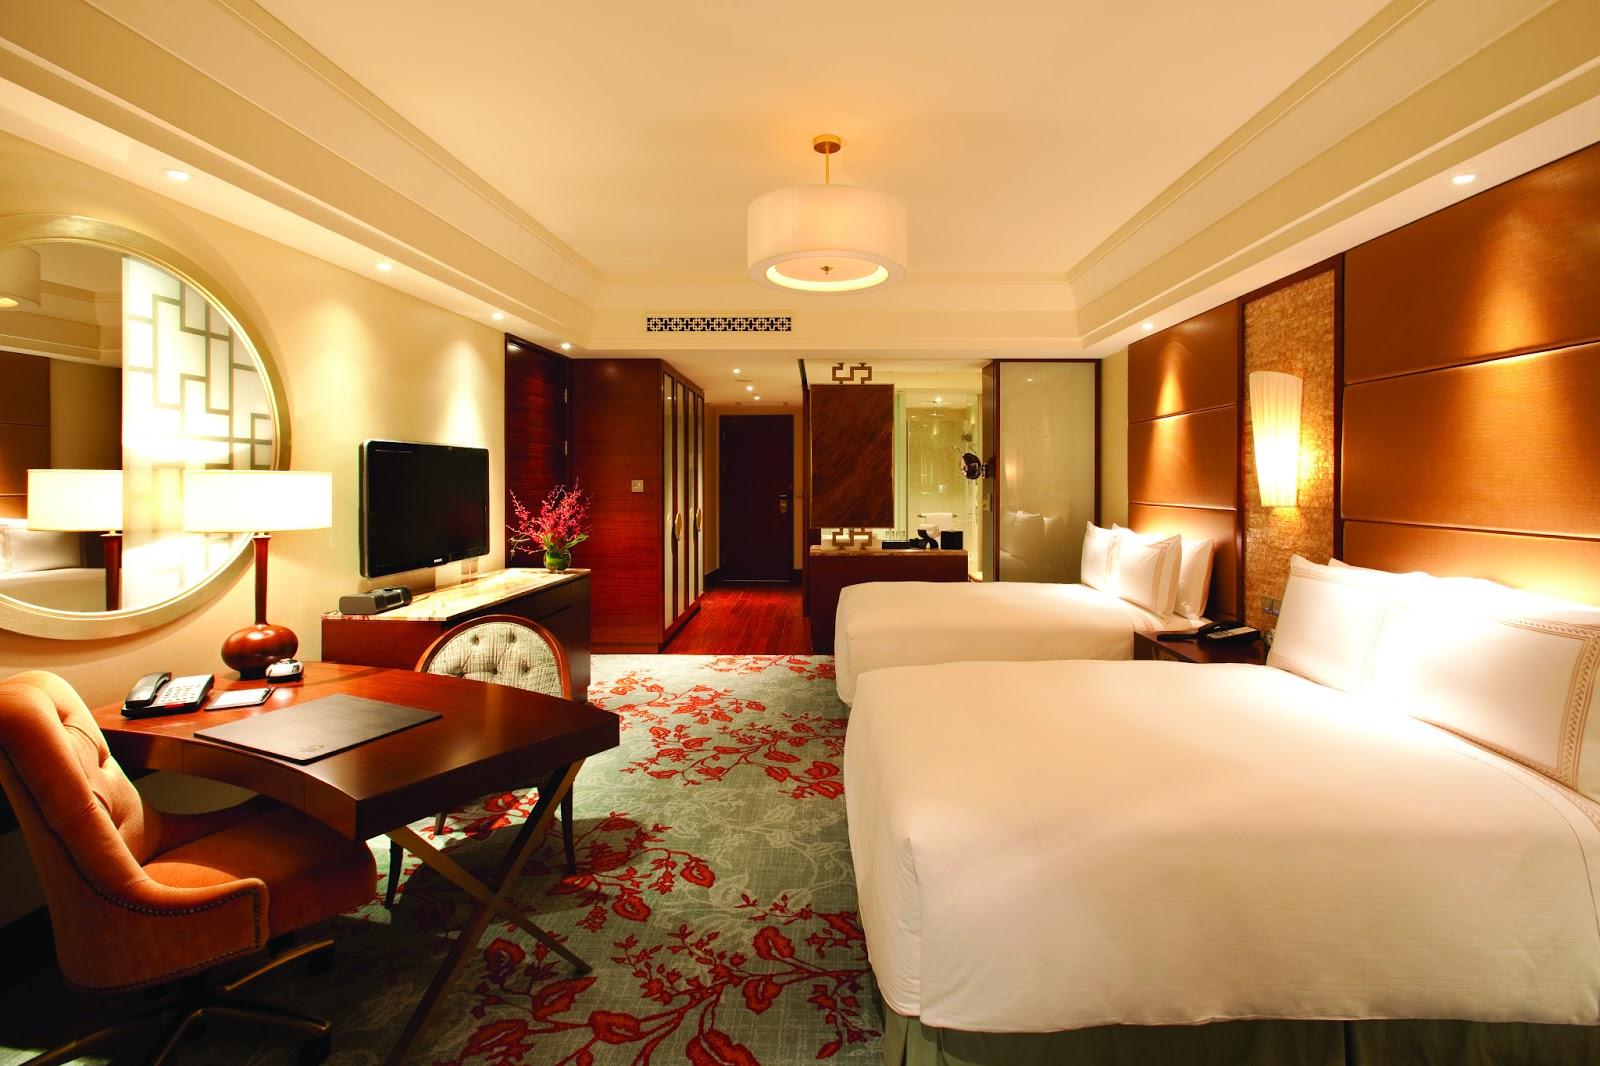 Luxury hotels interior 2014 for Luxury hotel interior